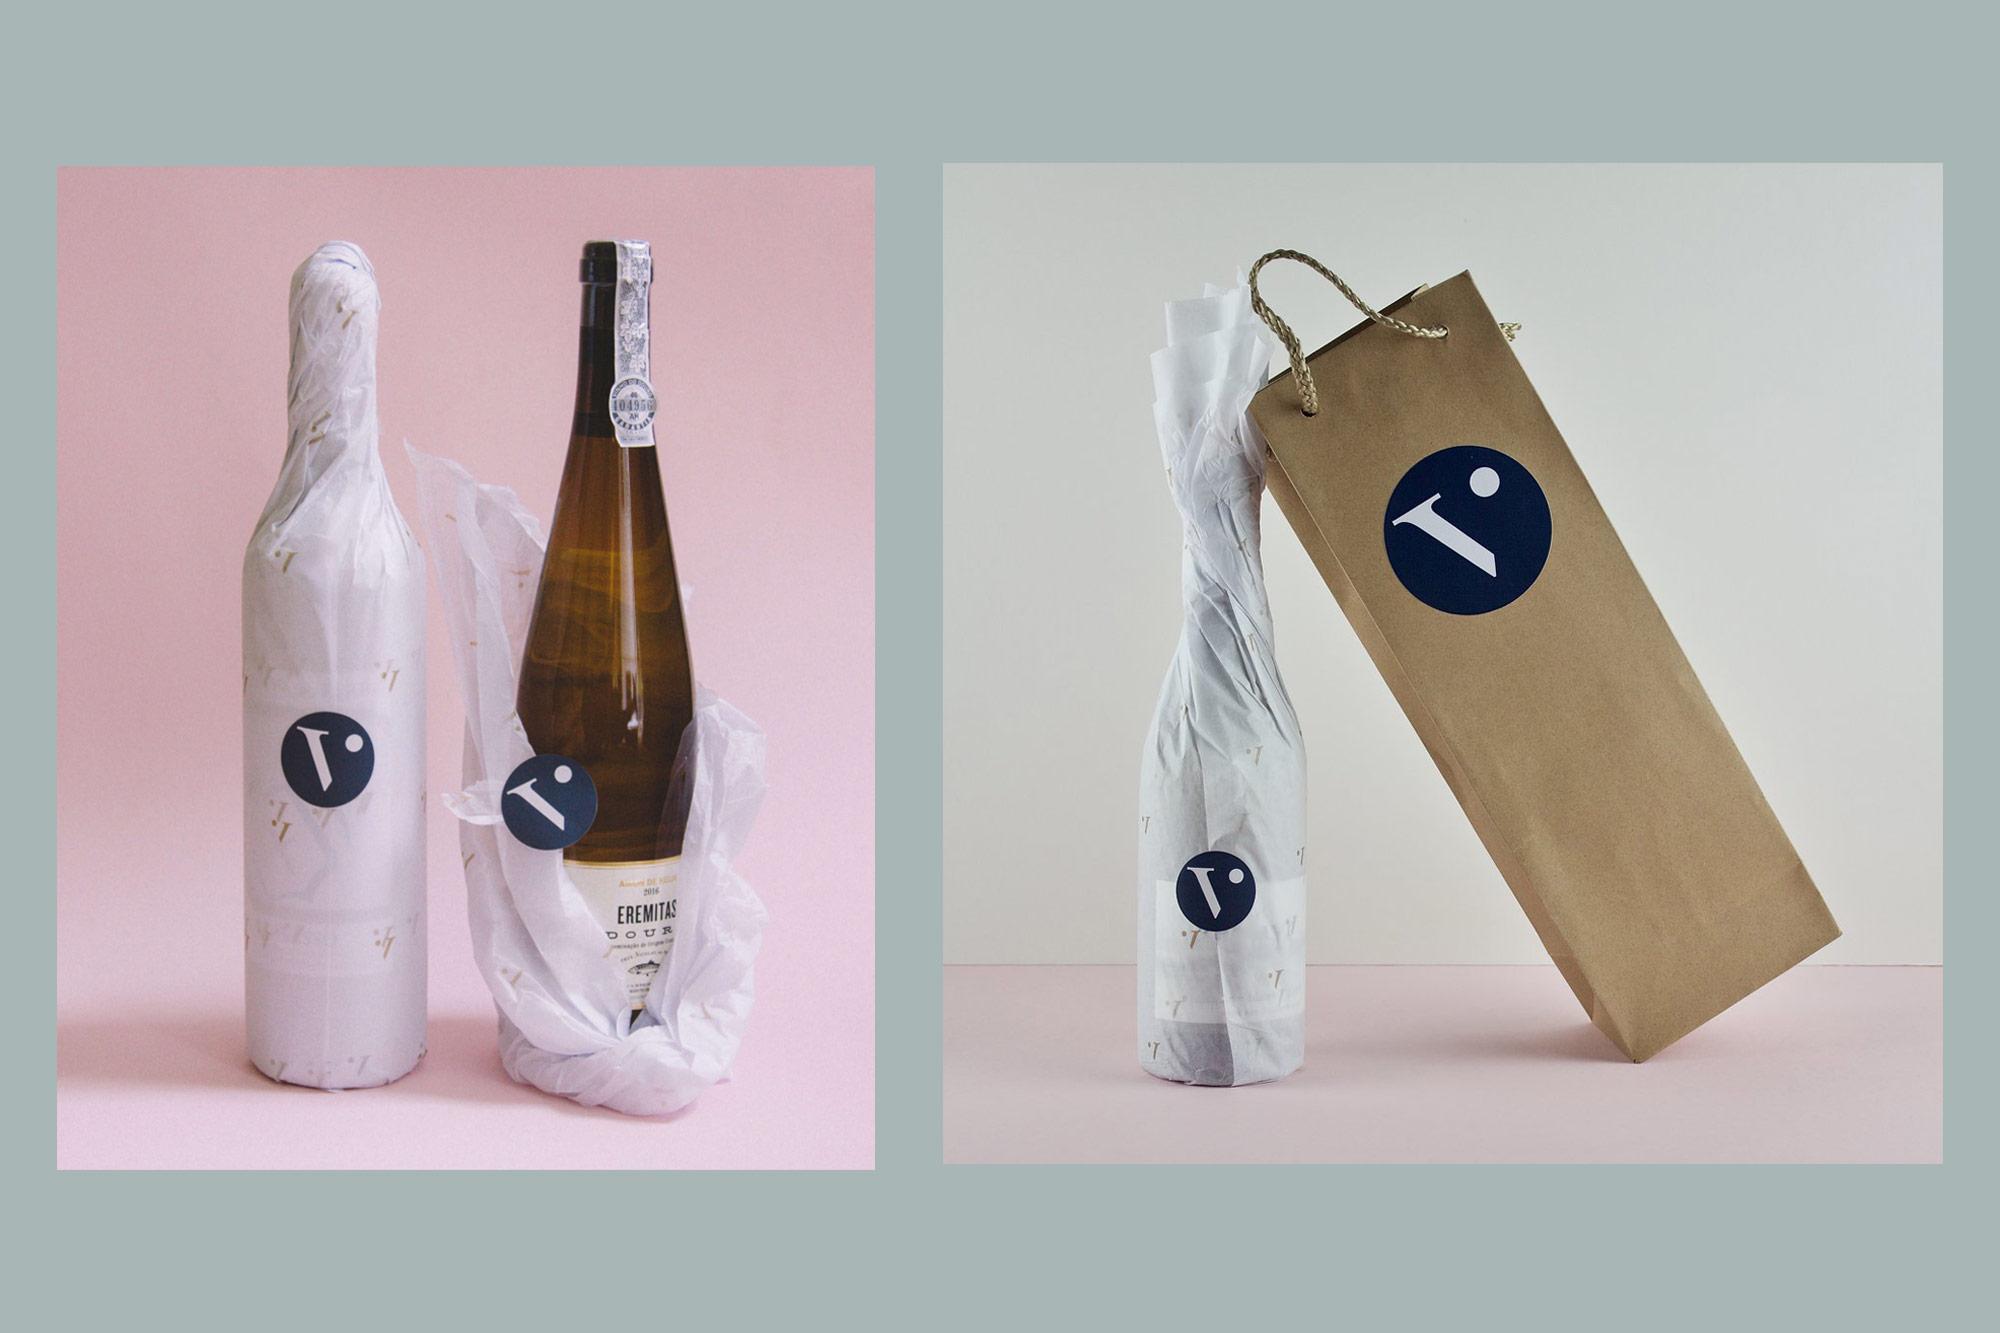 gareth-paul-jones-studio-design-vinterest-cs-v11a